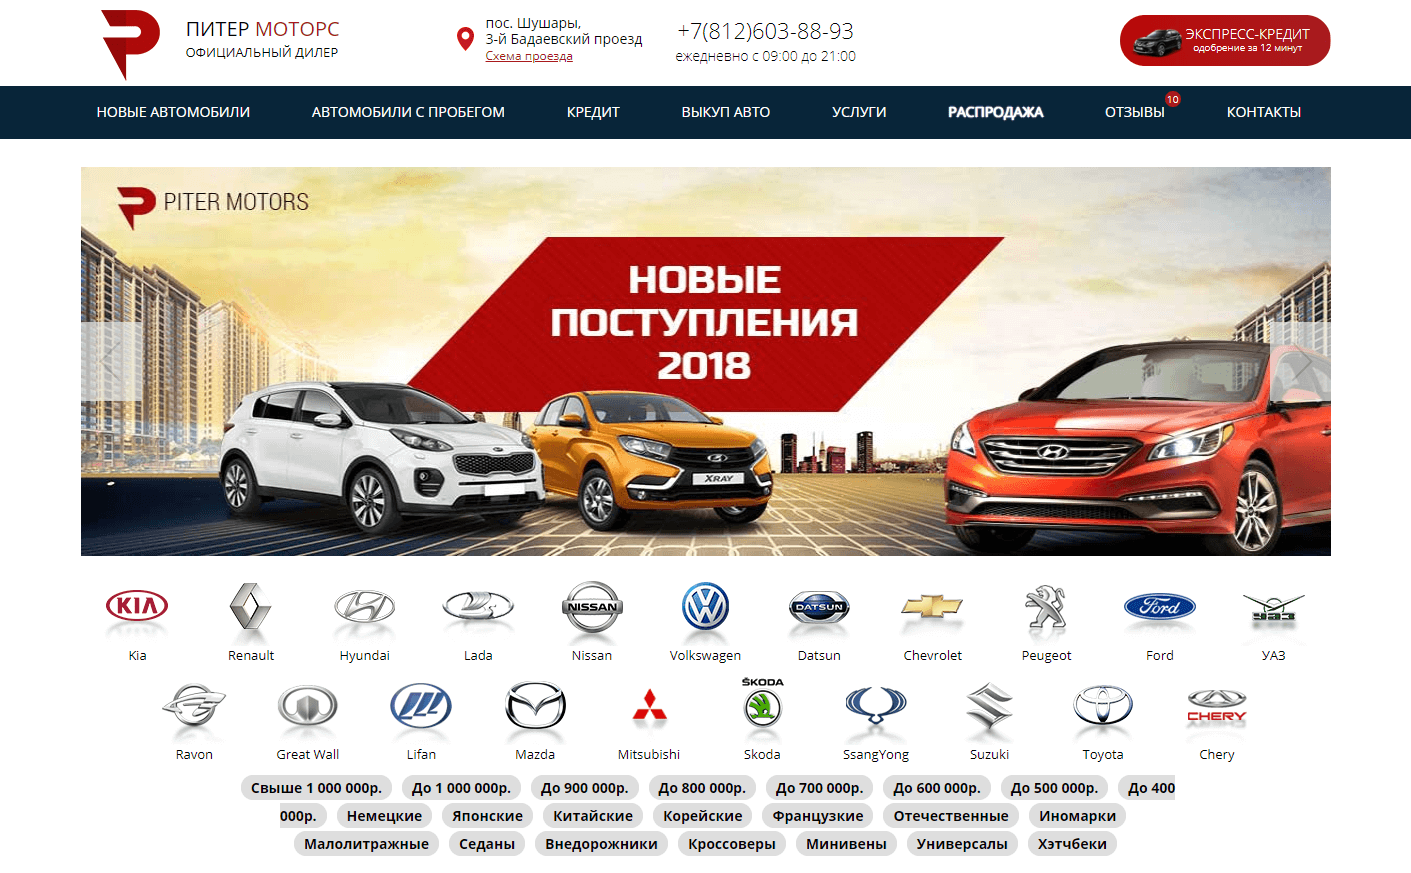 ПИТЕР МОТОРС